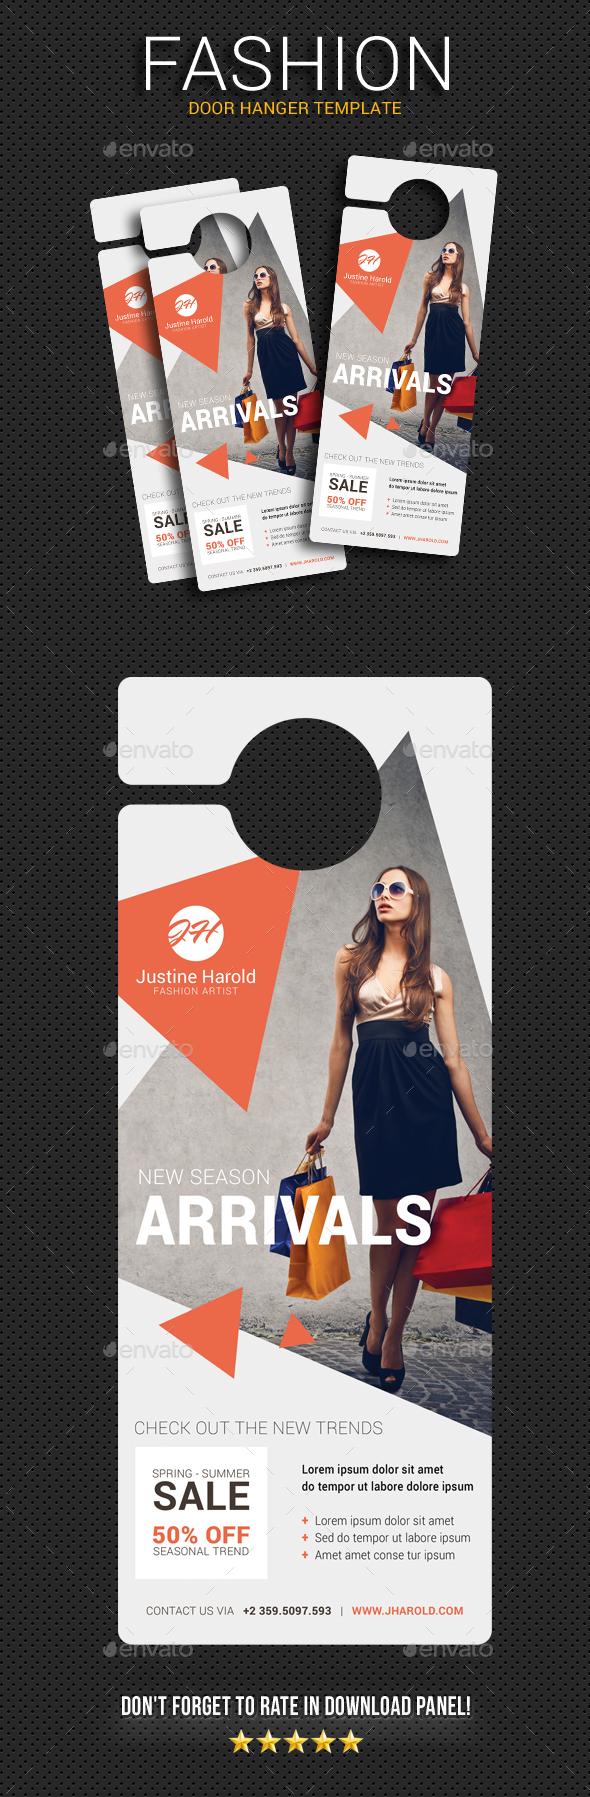 Fashion Door Hanger 3 - Miscellaneous Print Templates